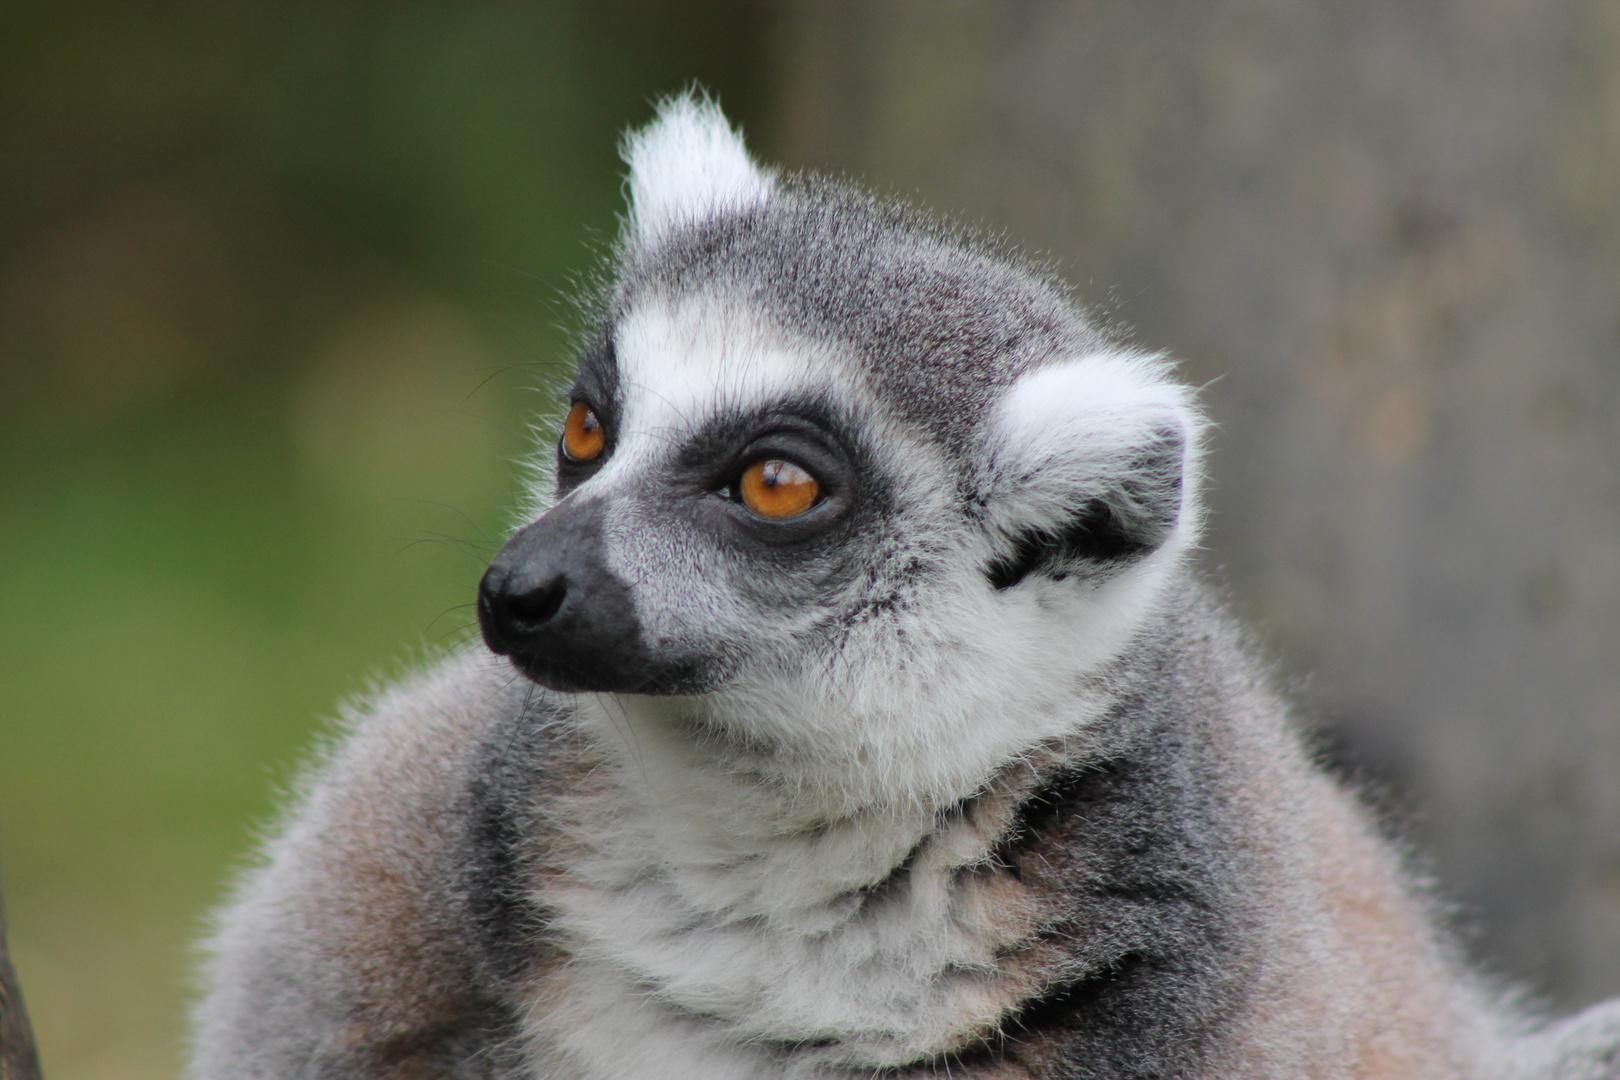 Katta im Duisburger Zoo!